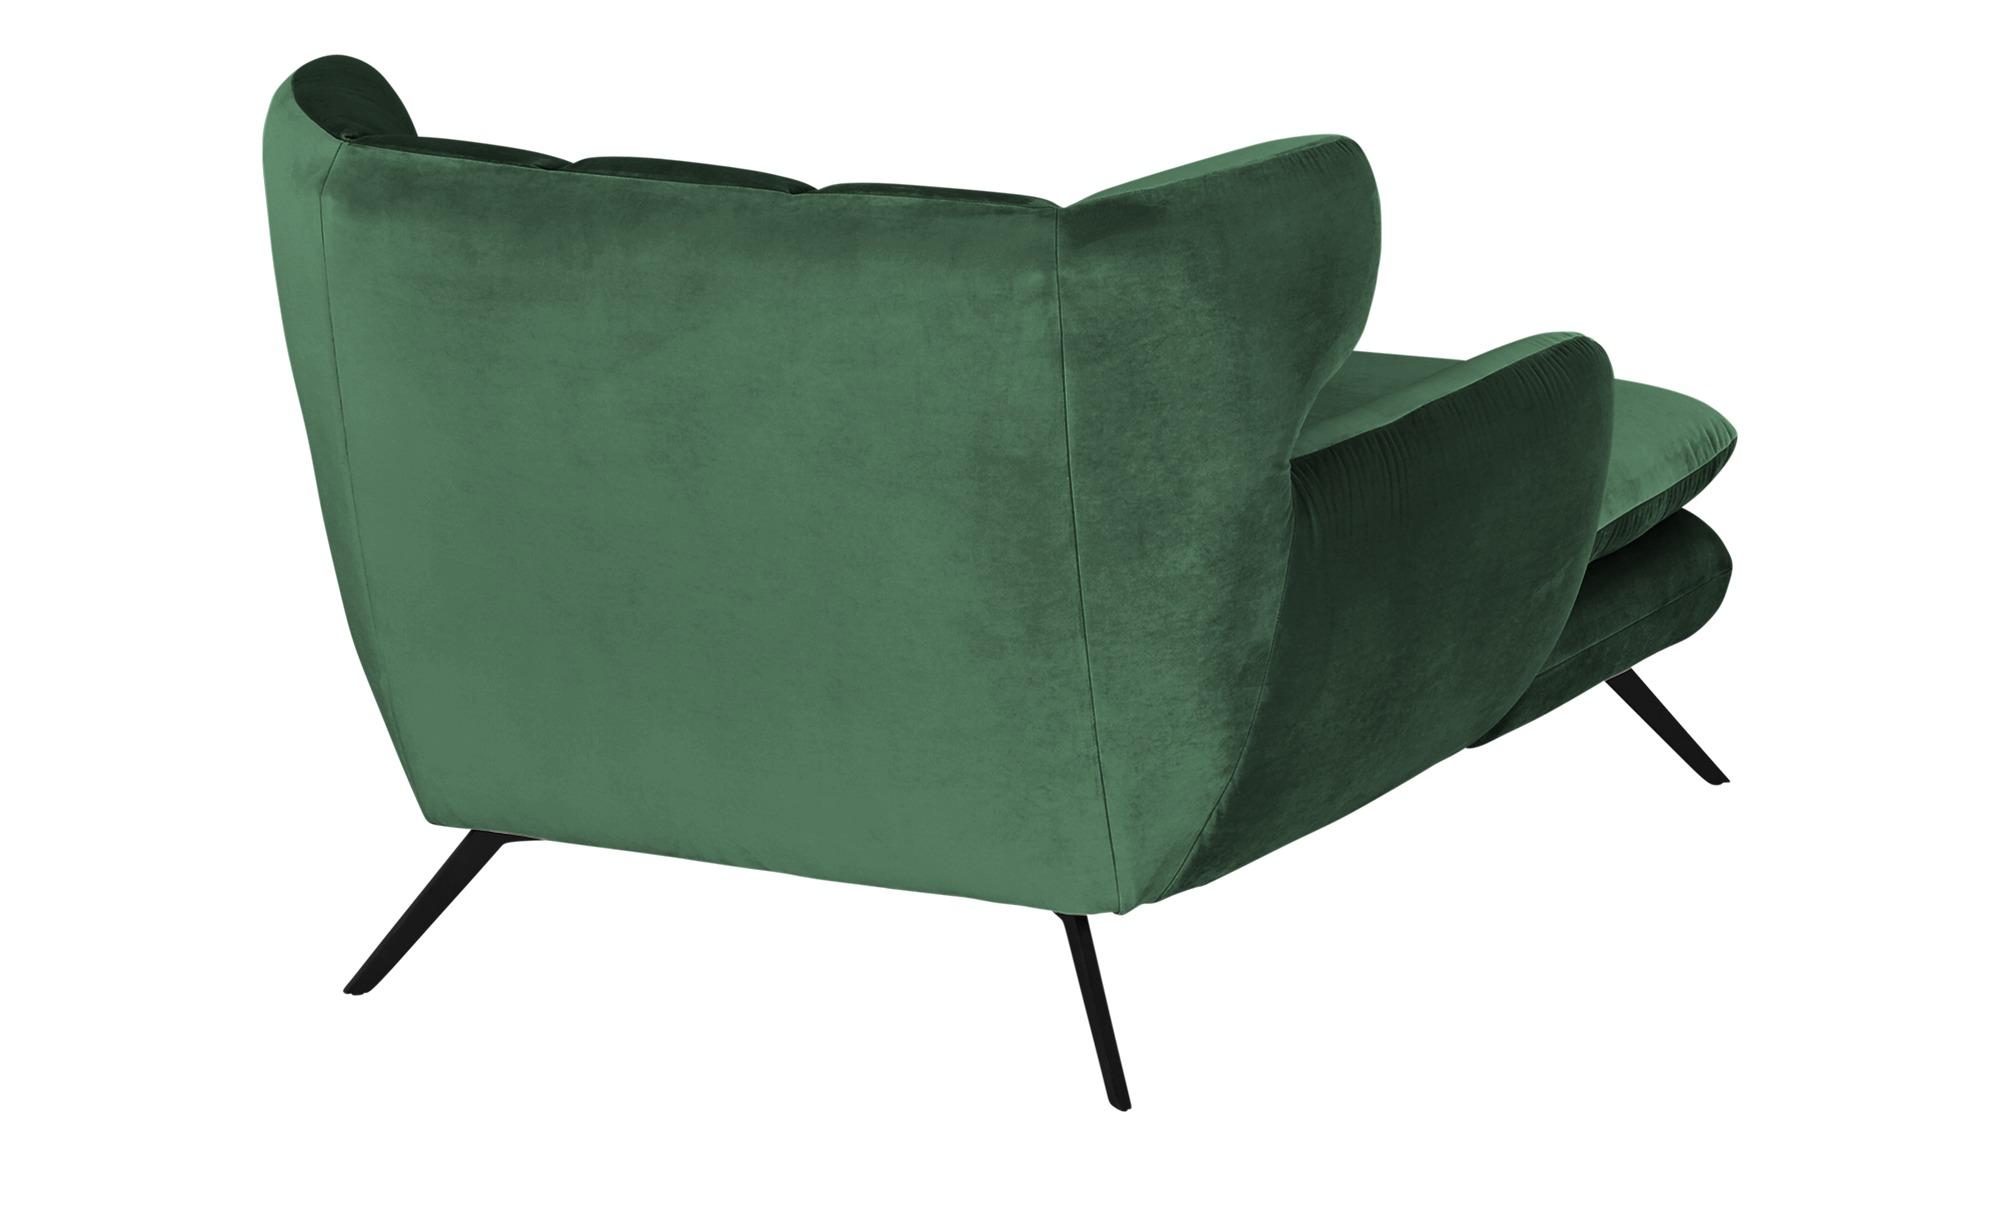 Longseat-Sessel  Caldara ¦ grün ¦ Maße (cm): B: 126 H: 94 T: 160 Polstermöbel > Sessel > Polstersessel - Höffner